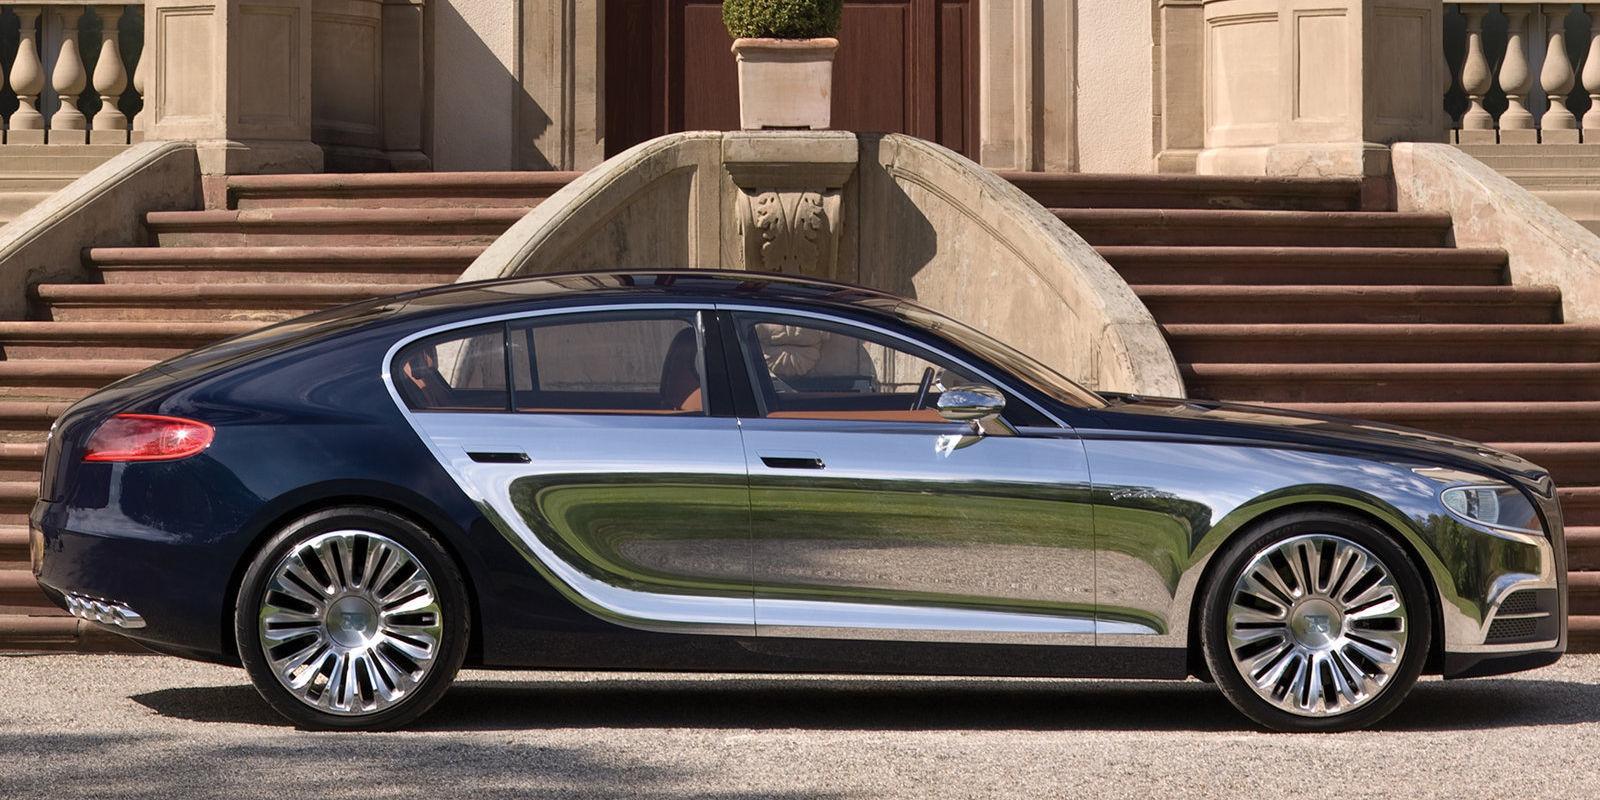 Bugatti S Next Car Might Be A Sedan